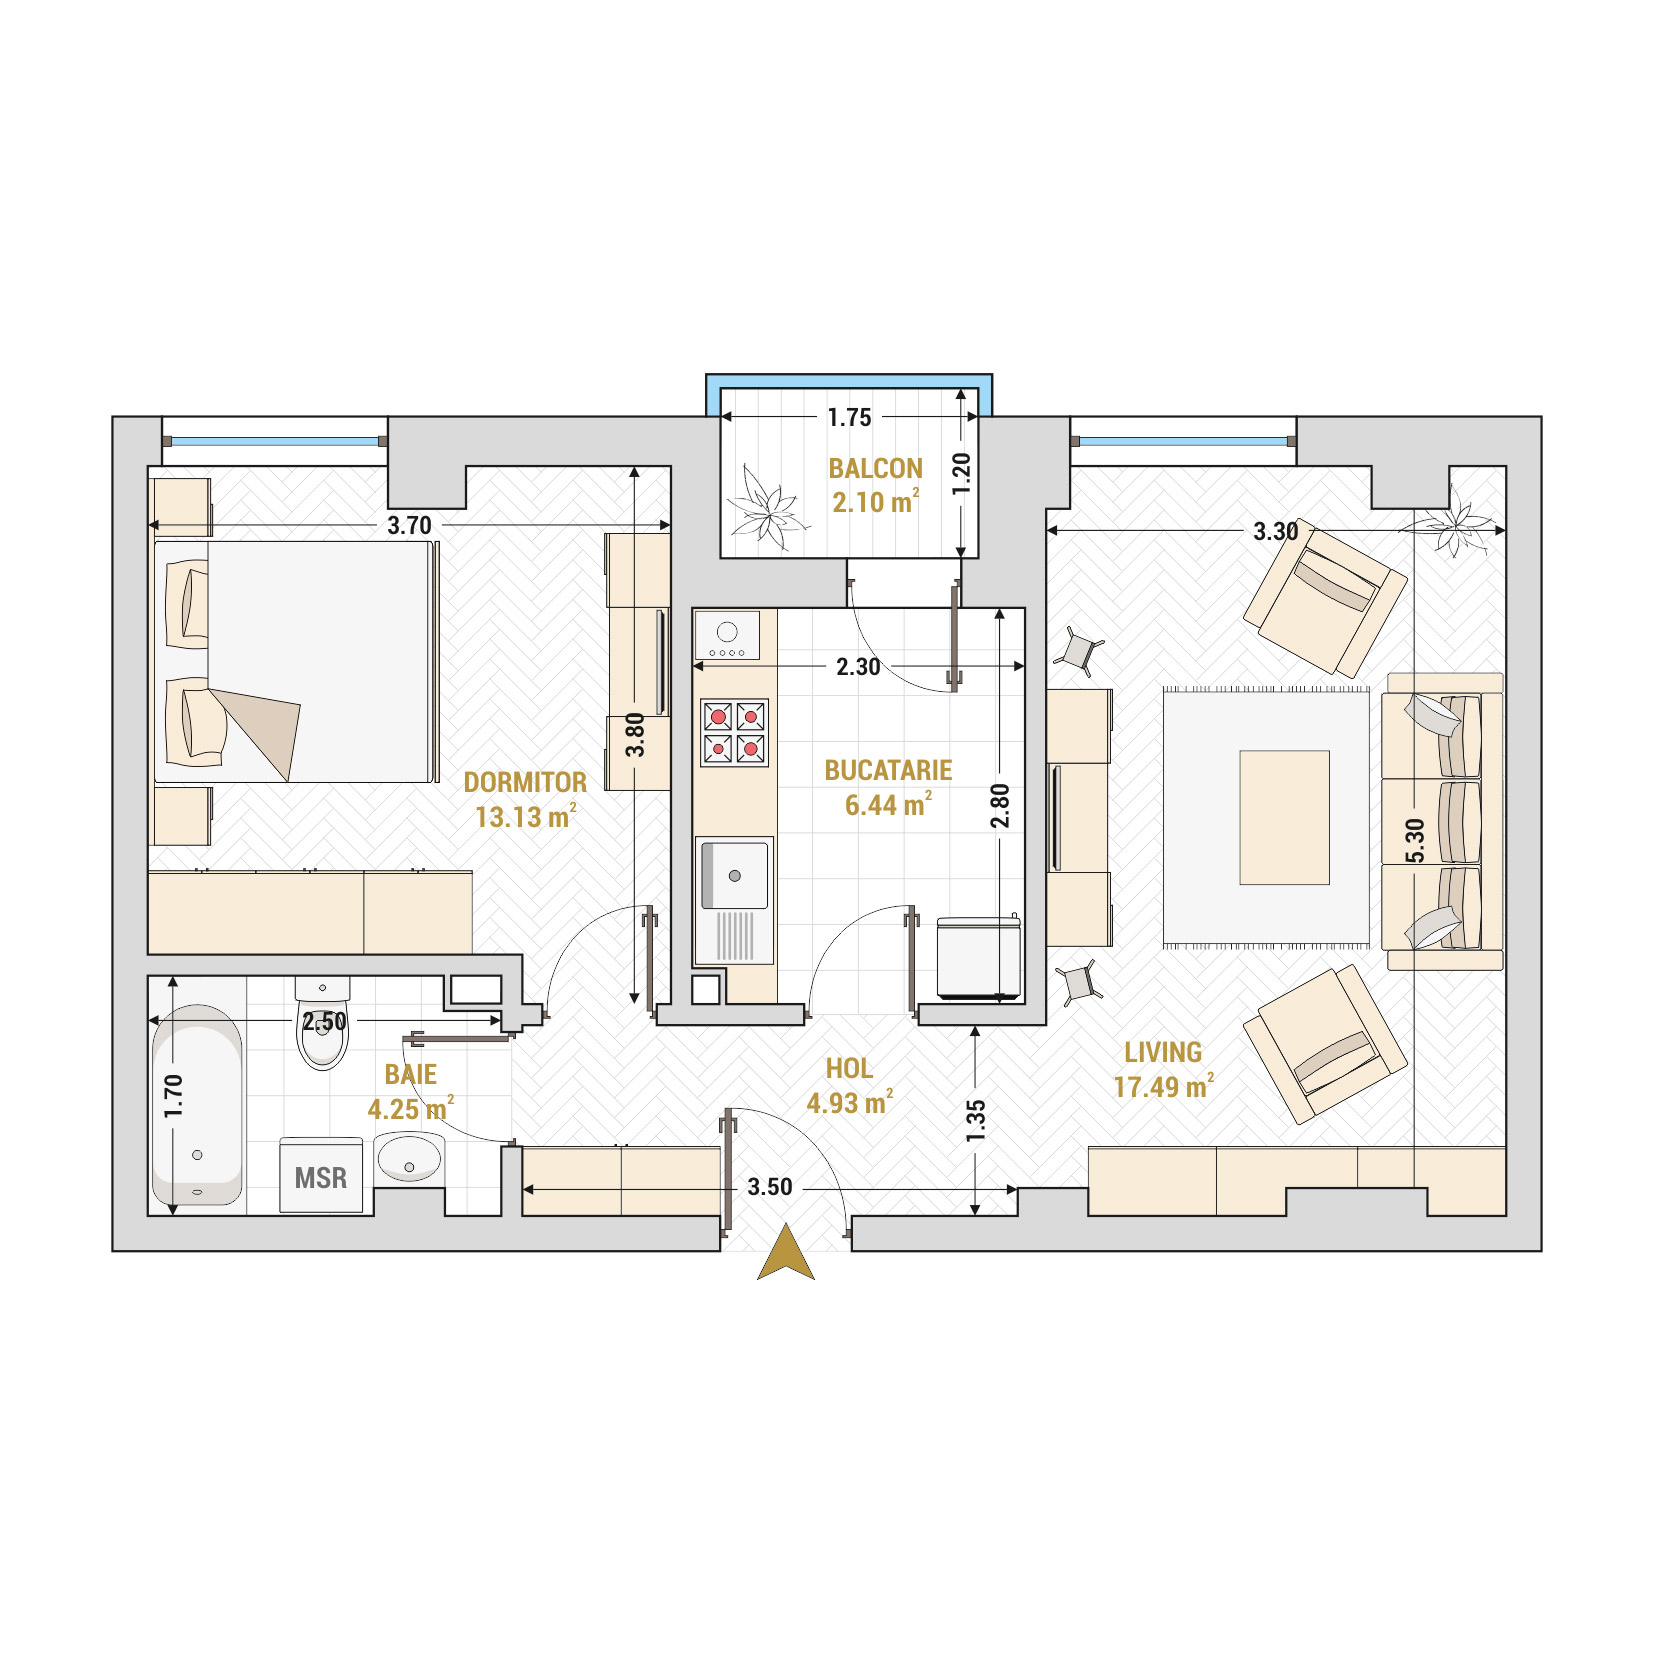 Apartament 2 camere de vanzare Bucuresti - Catedral Residence - Marriott, Piata Unirii, 13 Septembrie, Izvor - Tip 1 - T2A